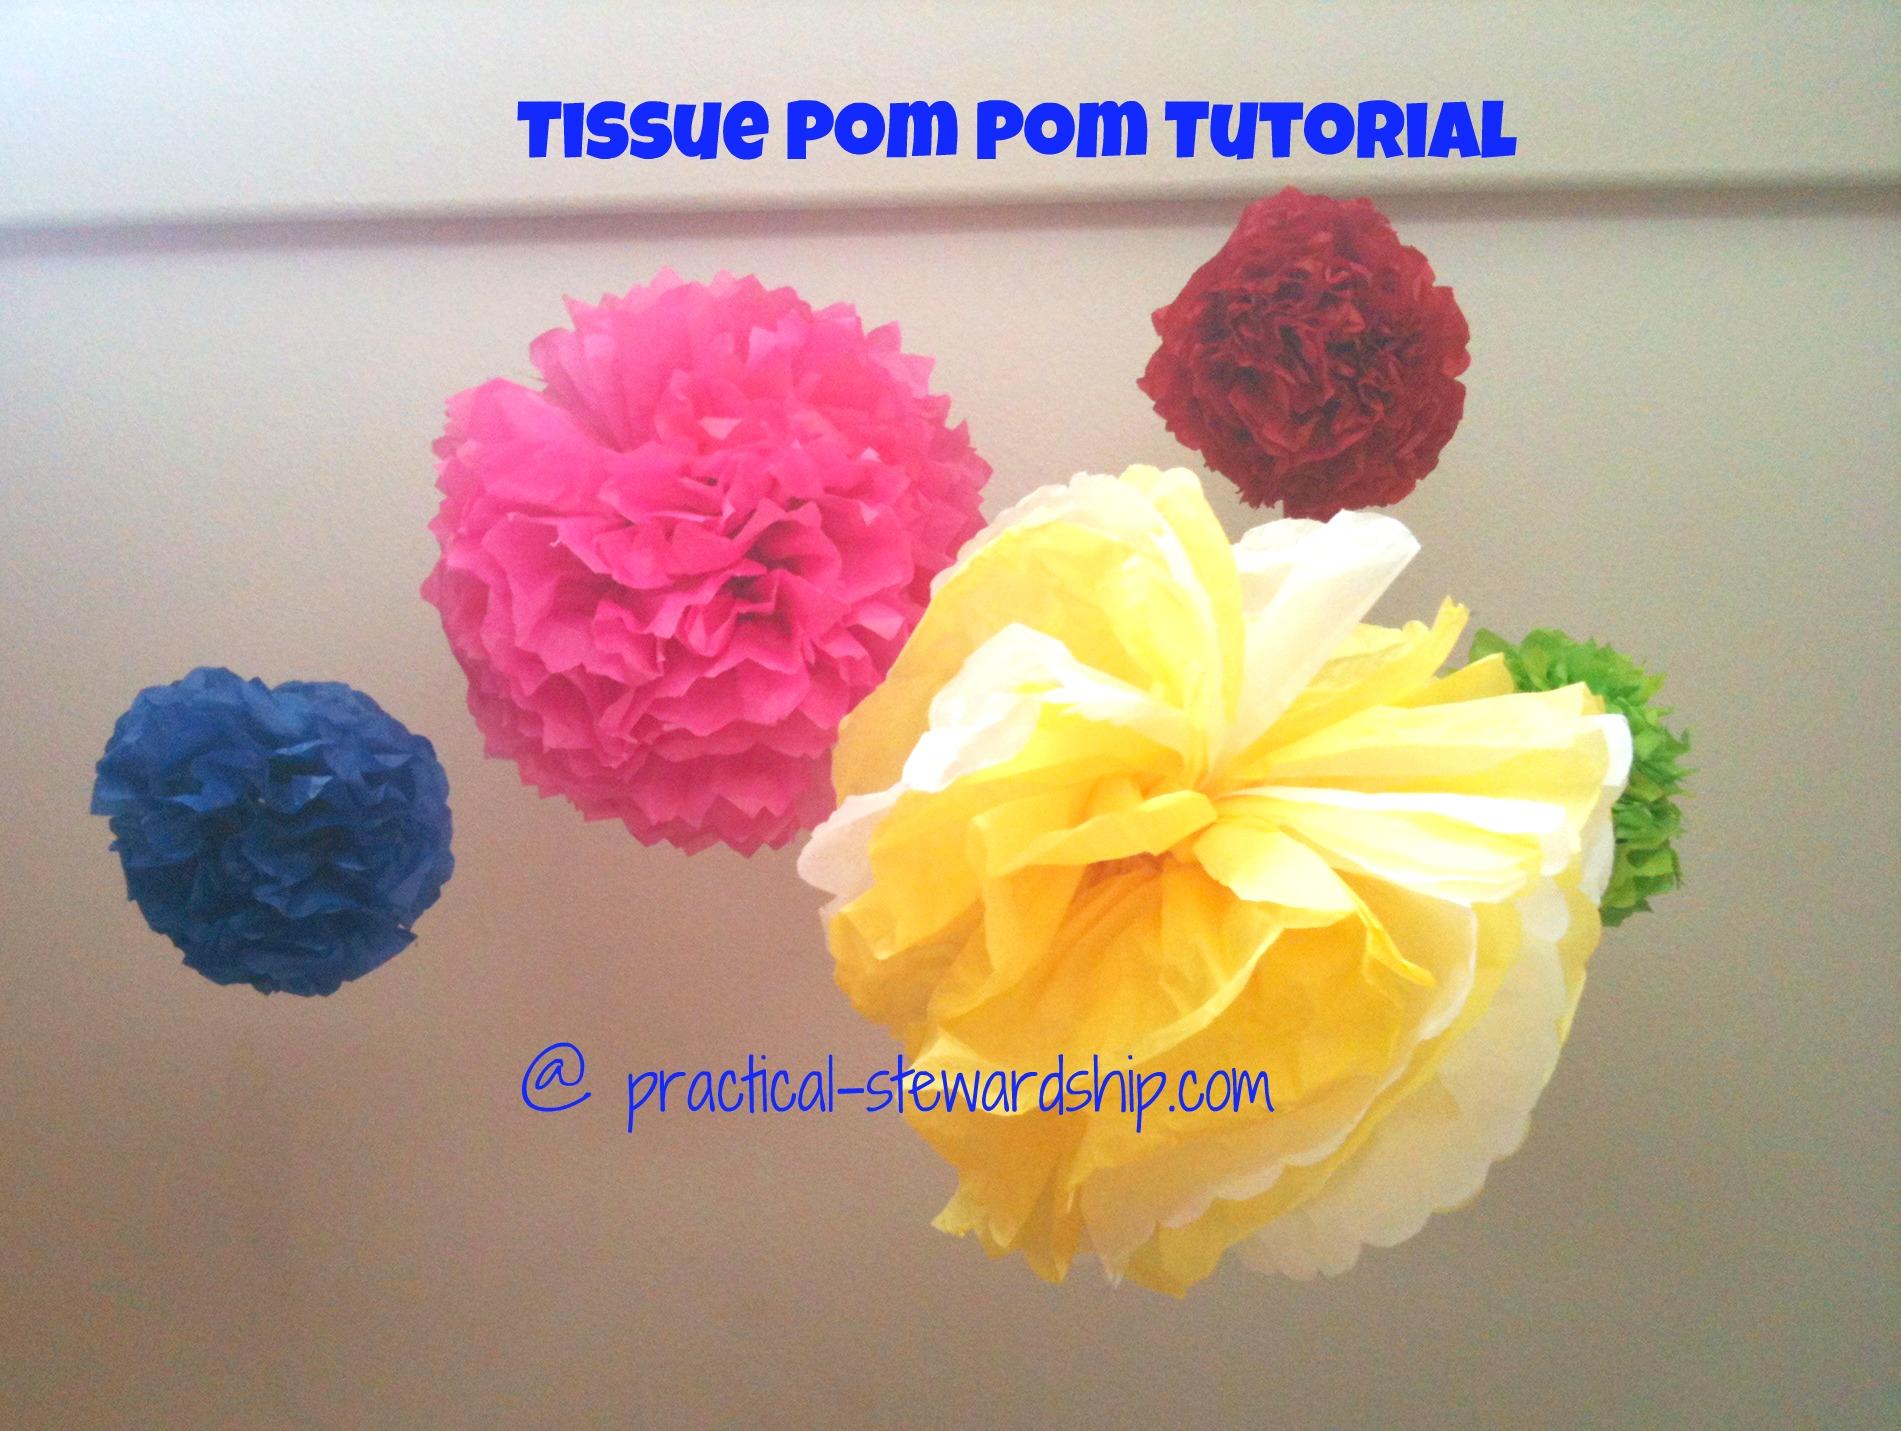 DIY: Tissue Pom Pom Decoration Tutorial